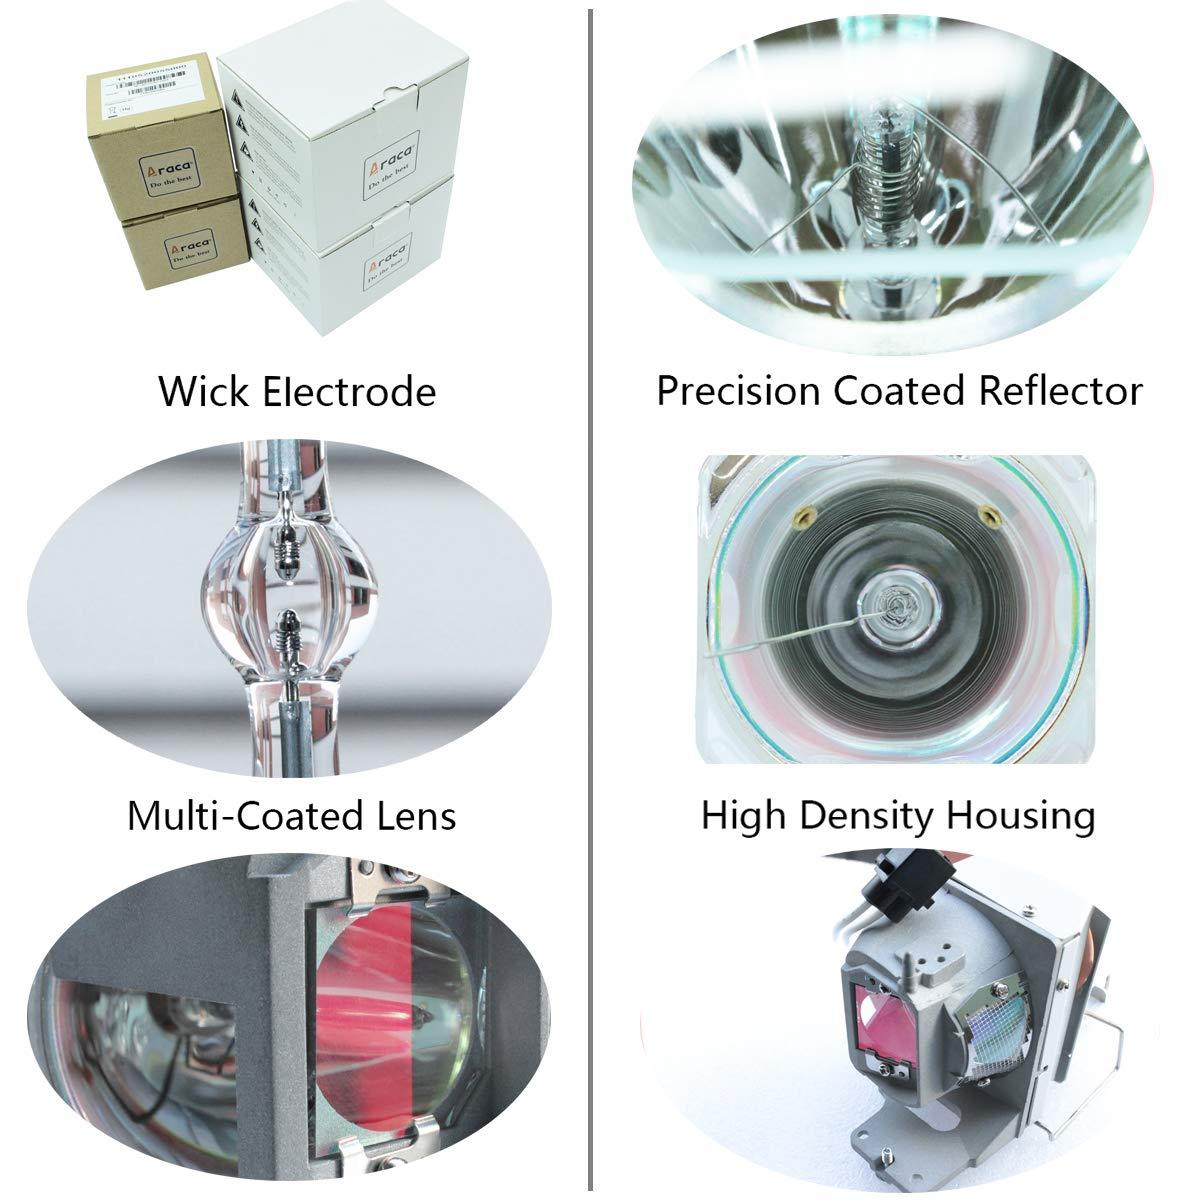 Araca 5J.J3T05.001 //5J.J8J05.001 Projector Lamp for Benq MW665 TH681 MW663 TH681 with Housing(Economical)